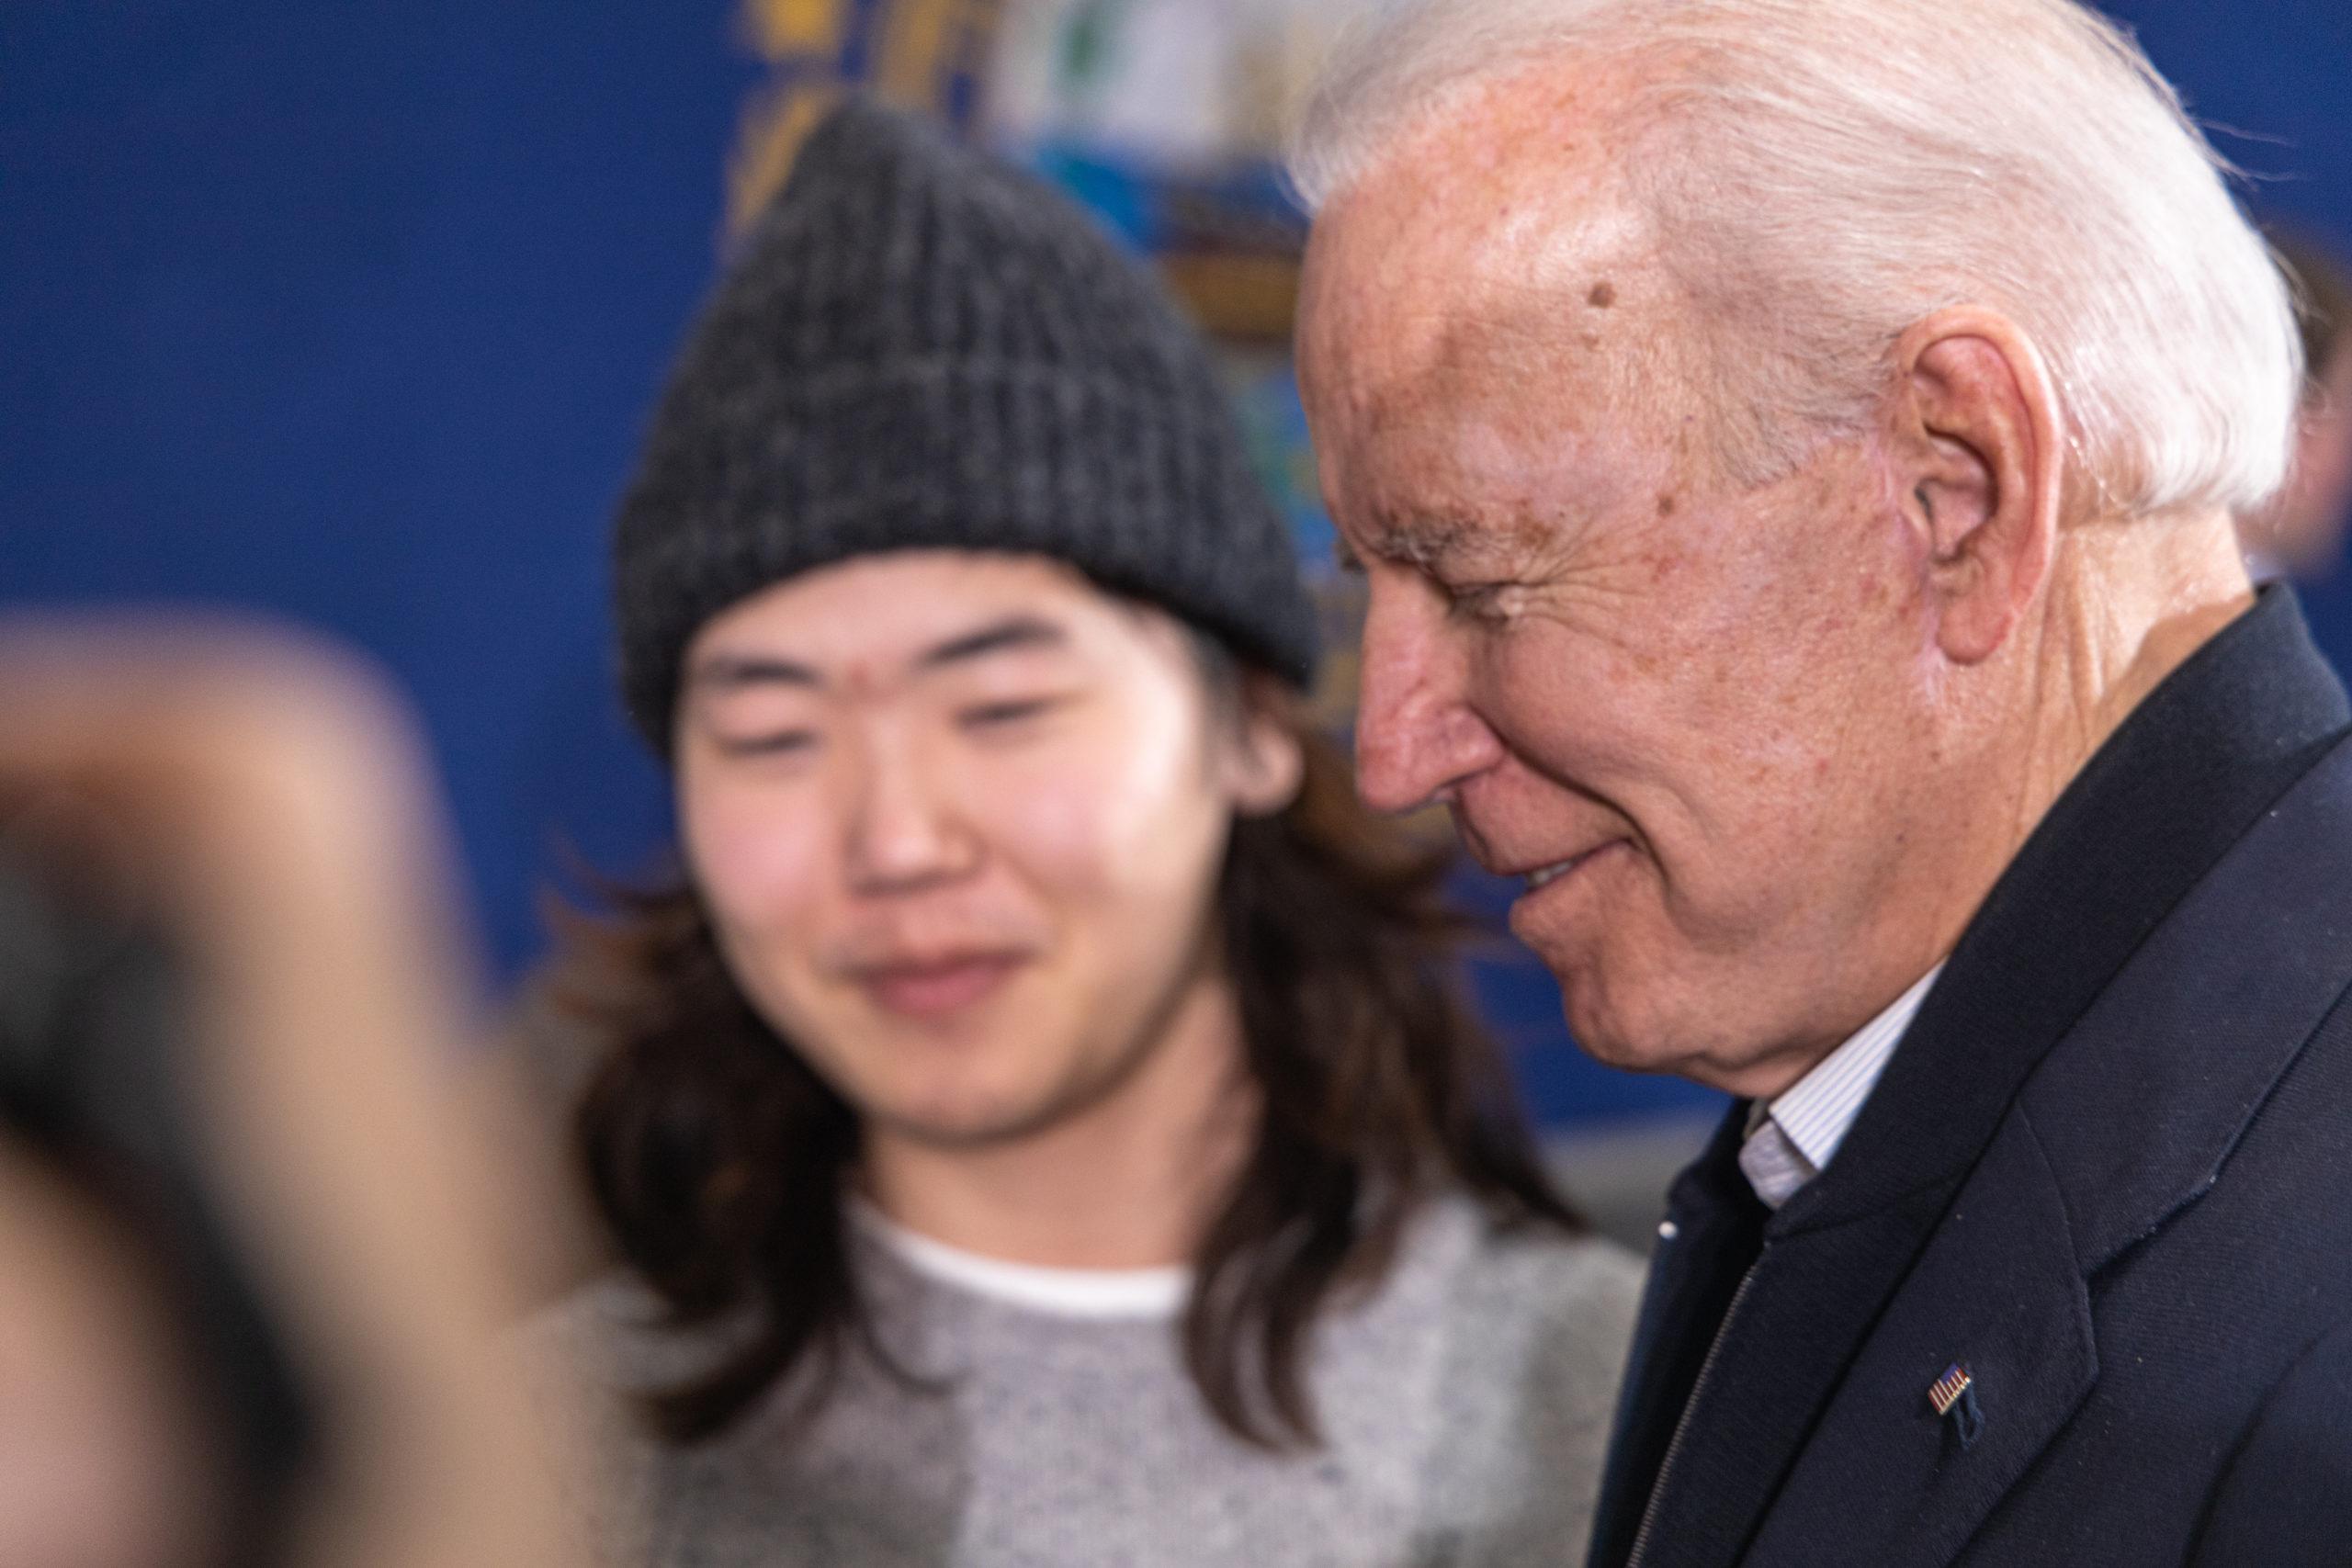 Top US pro-life priests: 'No Catholic can vote for Joe Biden'